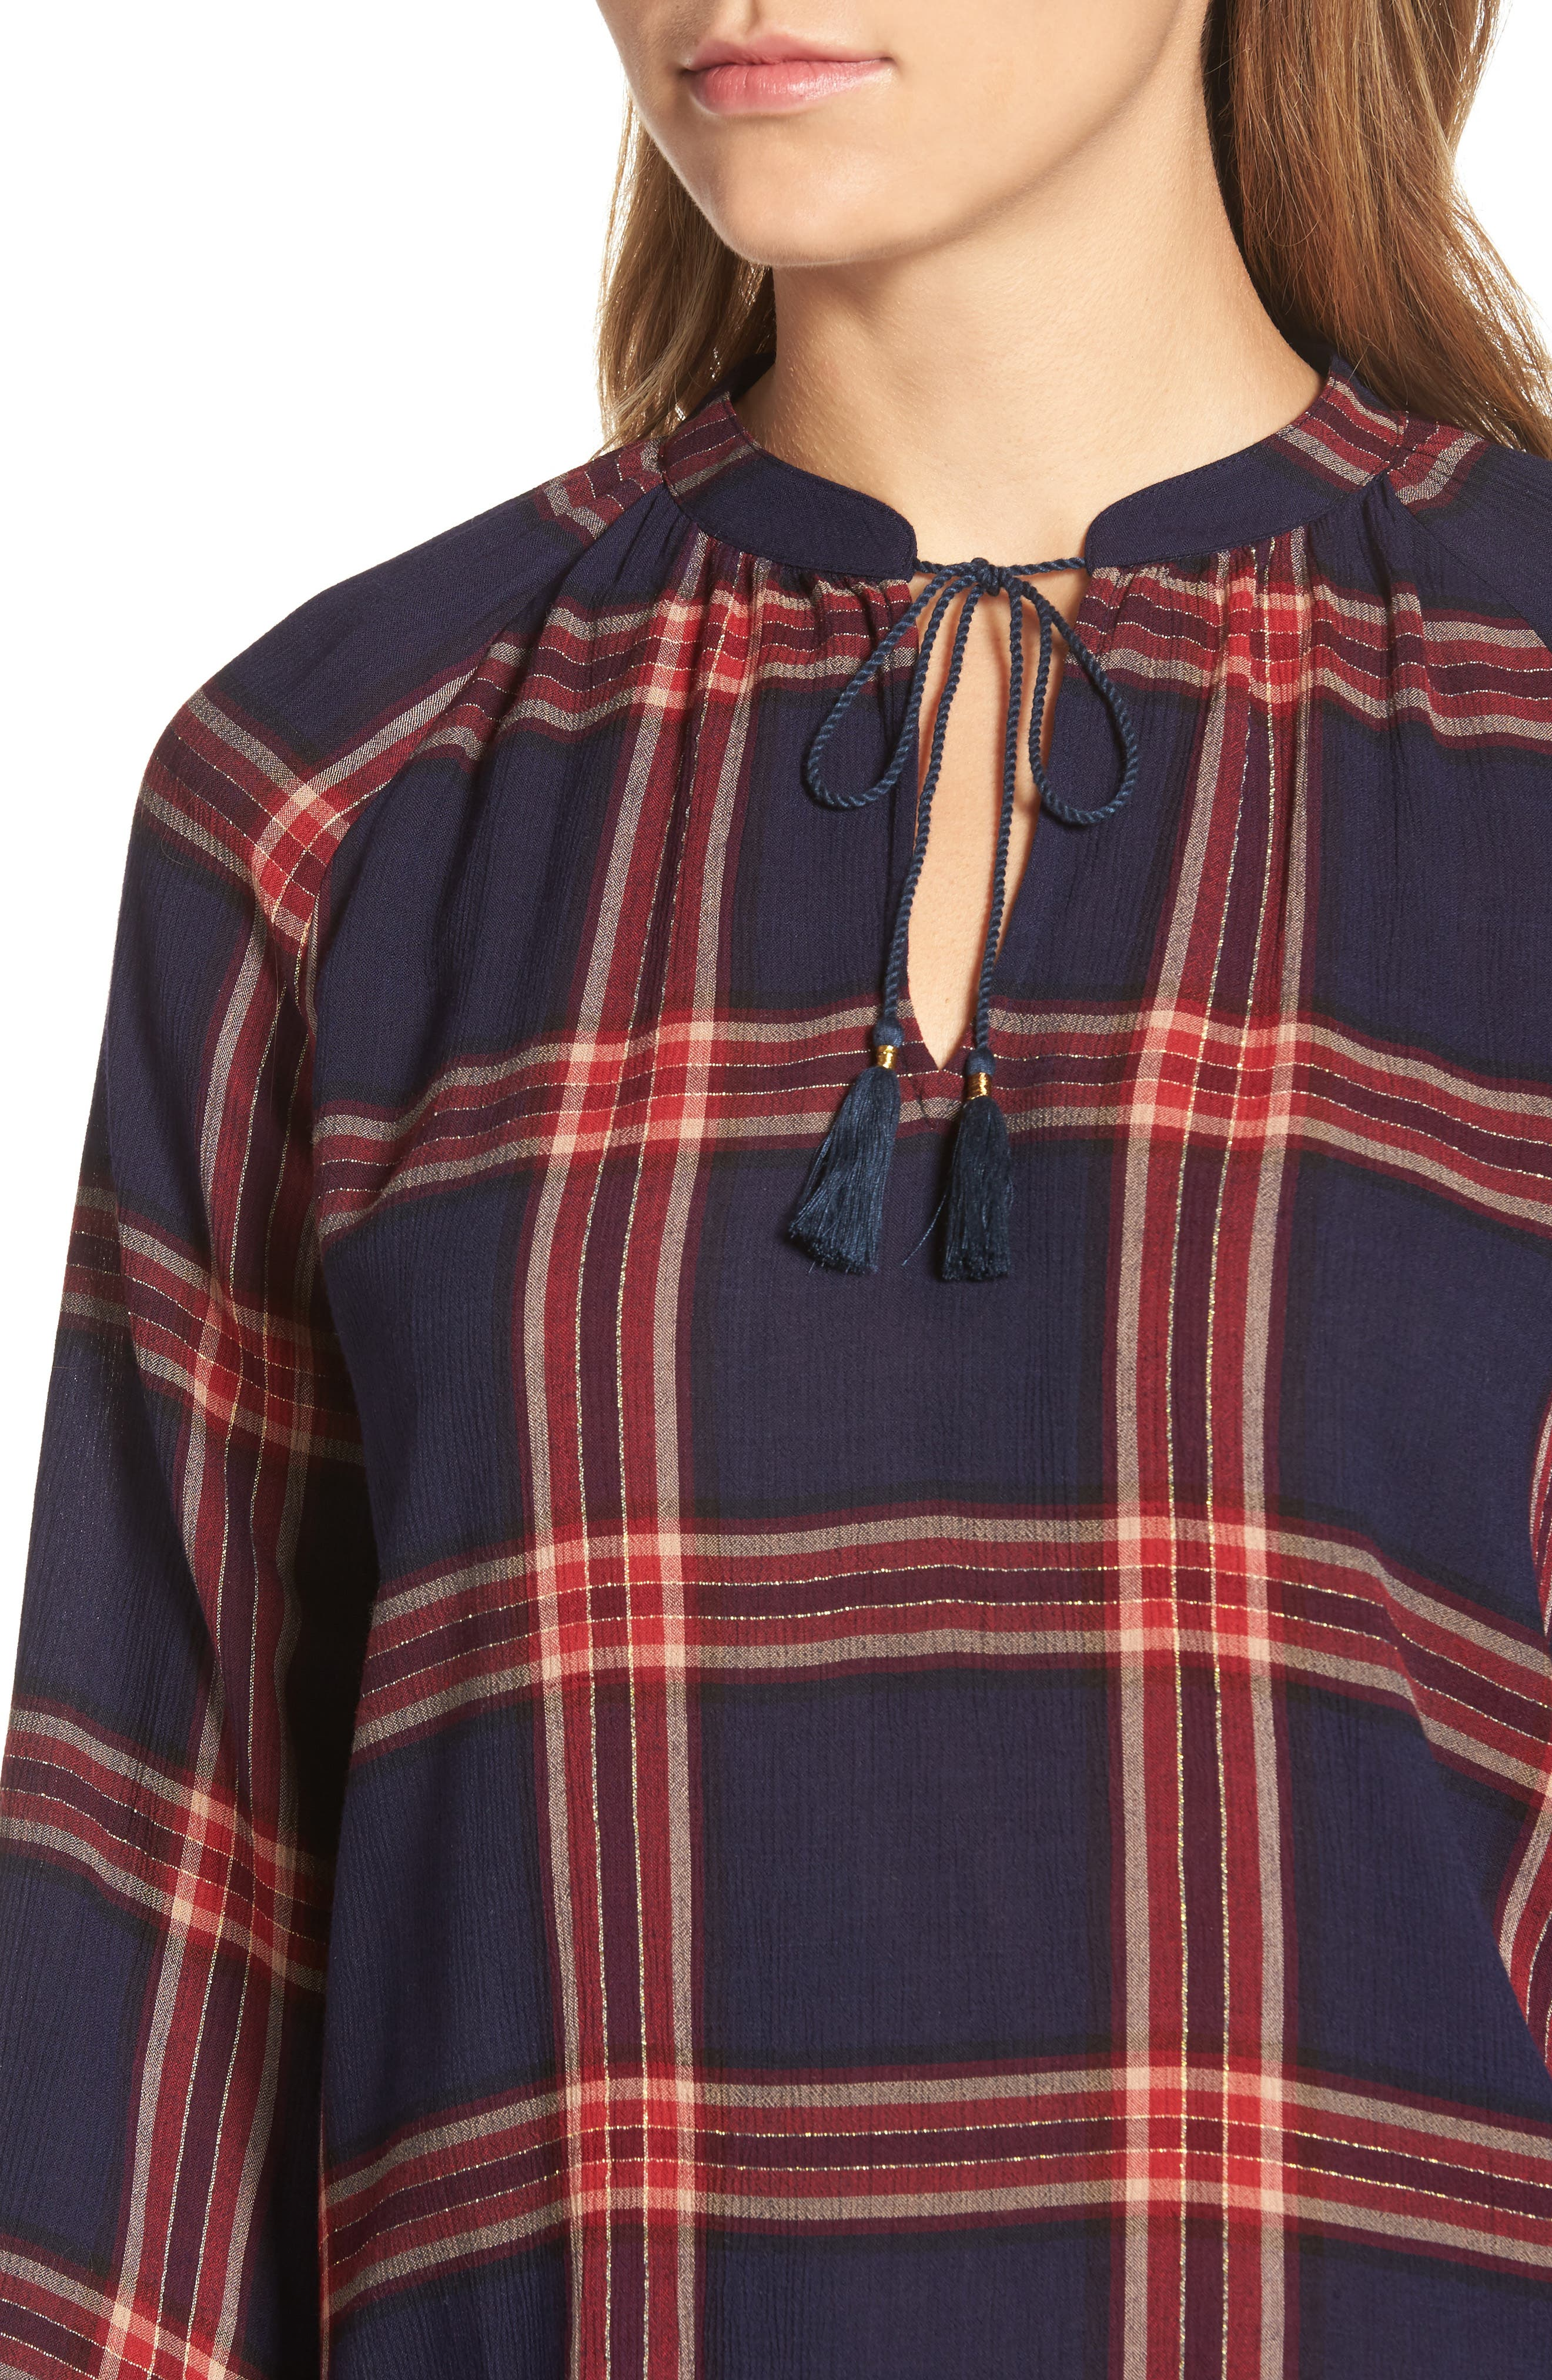 Plaid Shirt,                             Alternate thumbnail 4, color,                             400